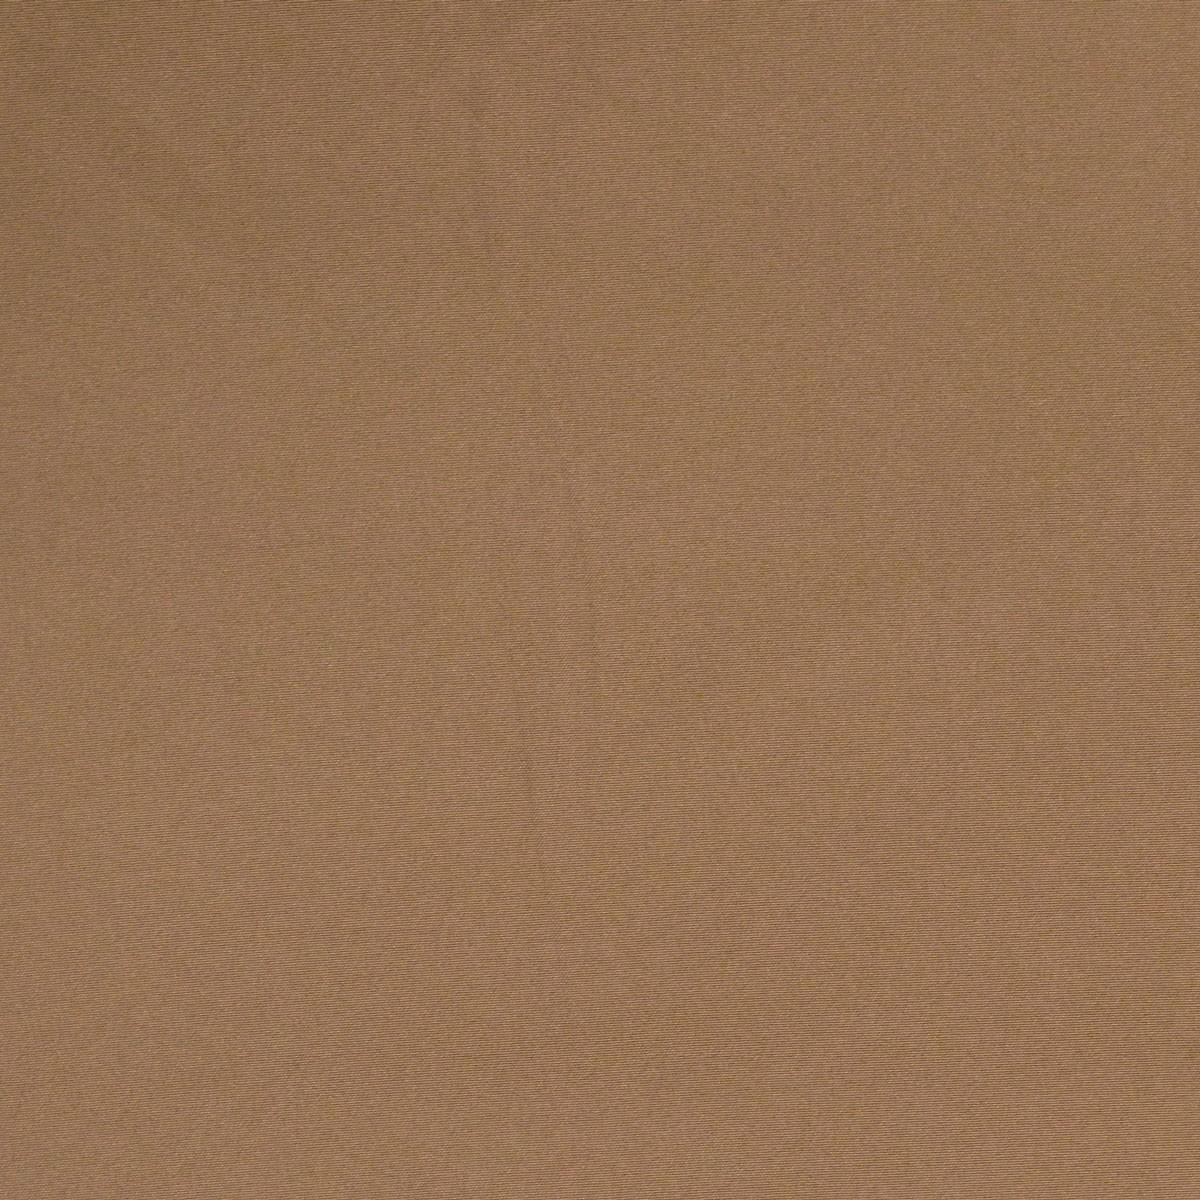 Kreativstoff Universalstoff Polyester Stretch camel braun